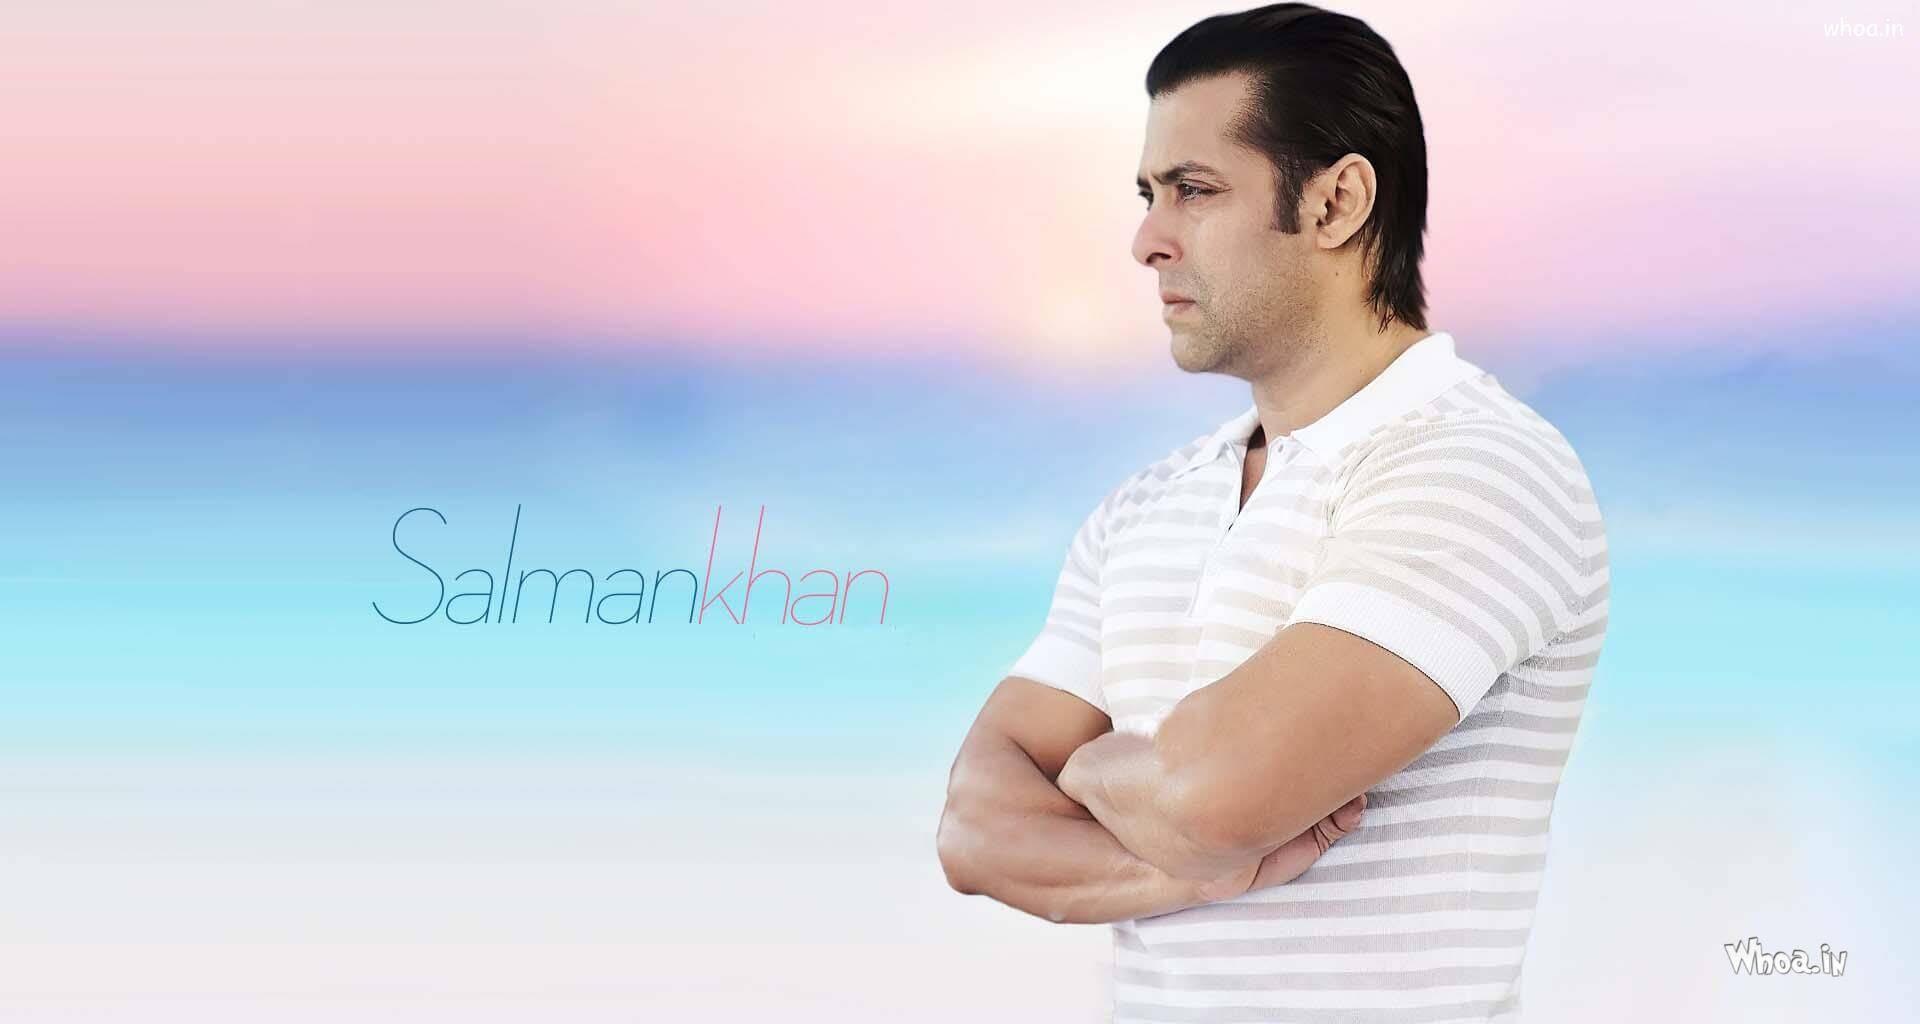 Salman Khan Photo, Age, News, Birthday, Height, Sister, Biography, Girlfriend, Awards, Address, Song, Video, Net Worth, Education, Twitter, Instagram, Facebook, Wiki, Imdb, Website, Youtube (105)